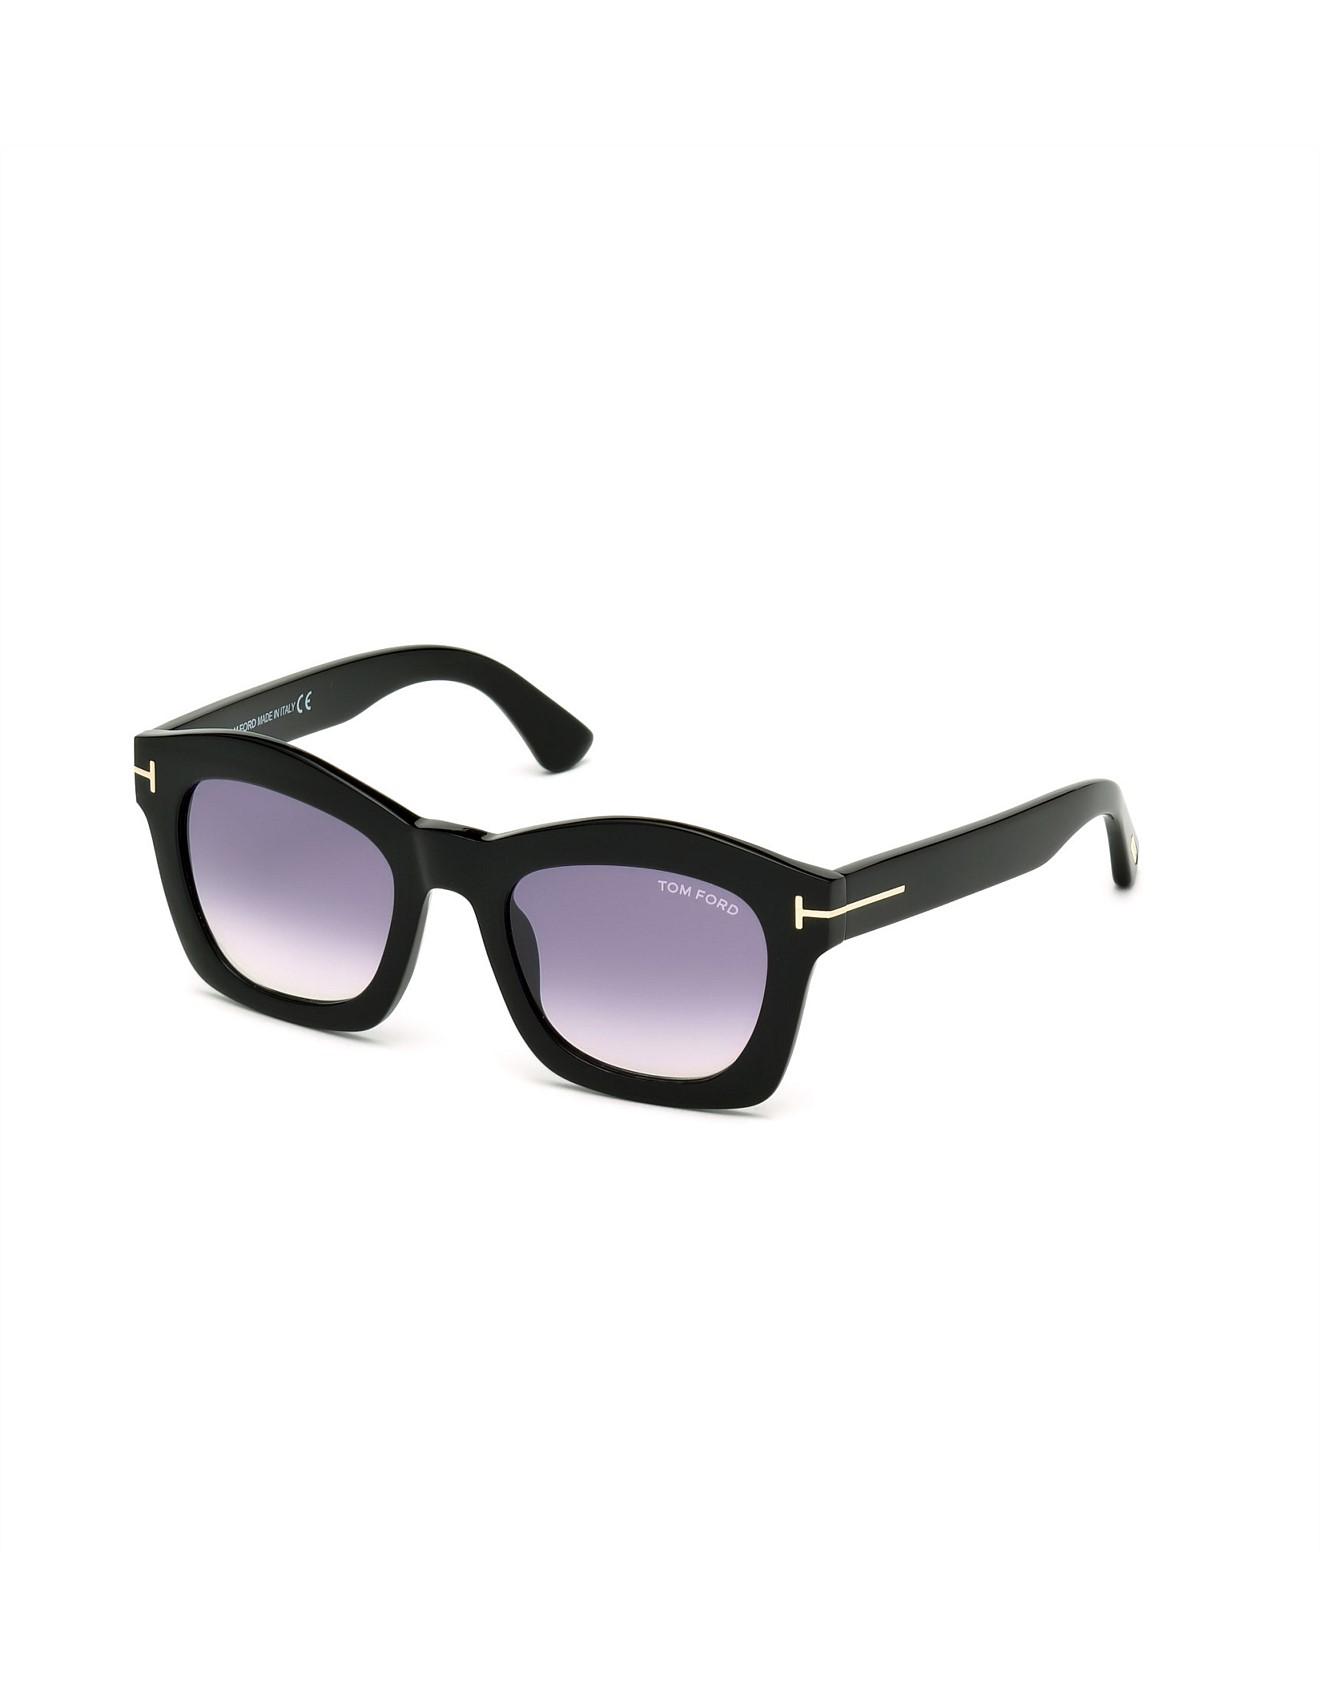 f755a9e506b5 Sunglasses - TOM FORD